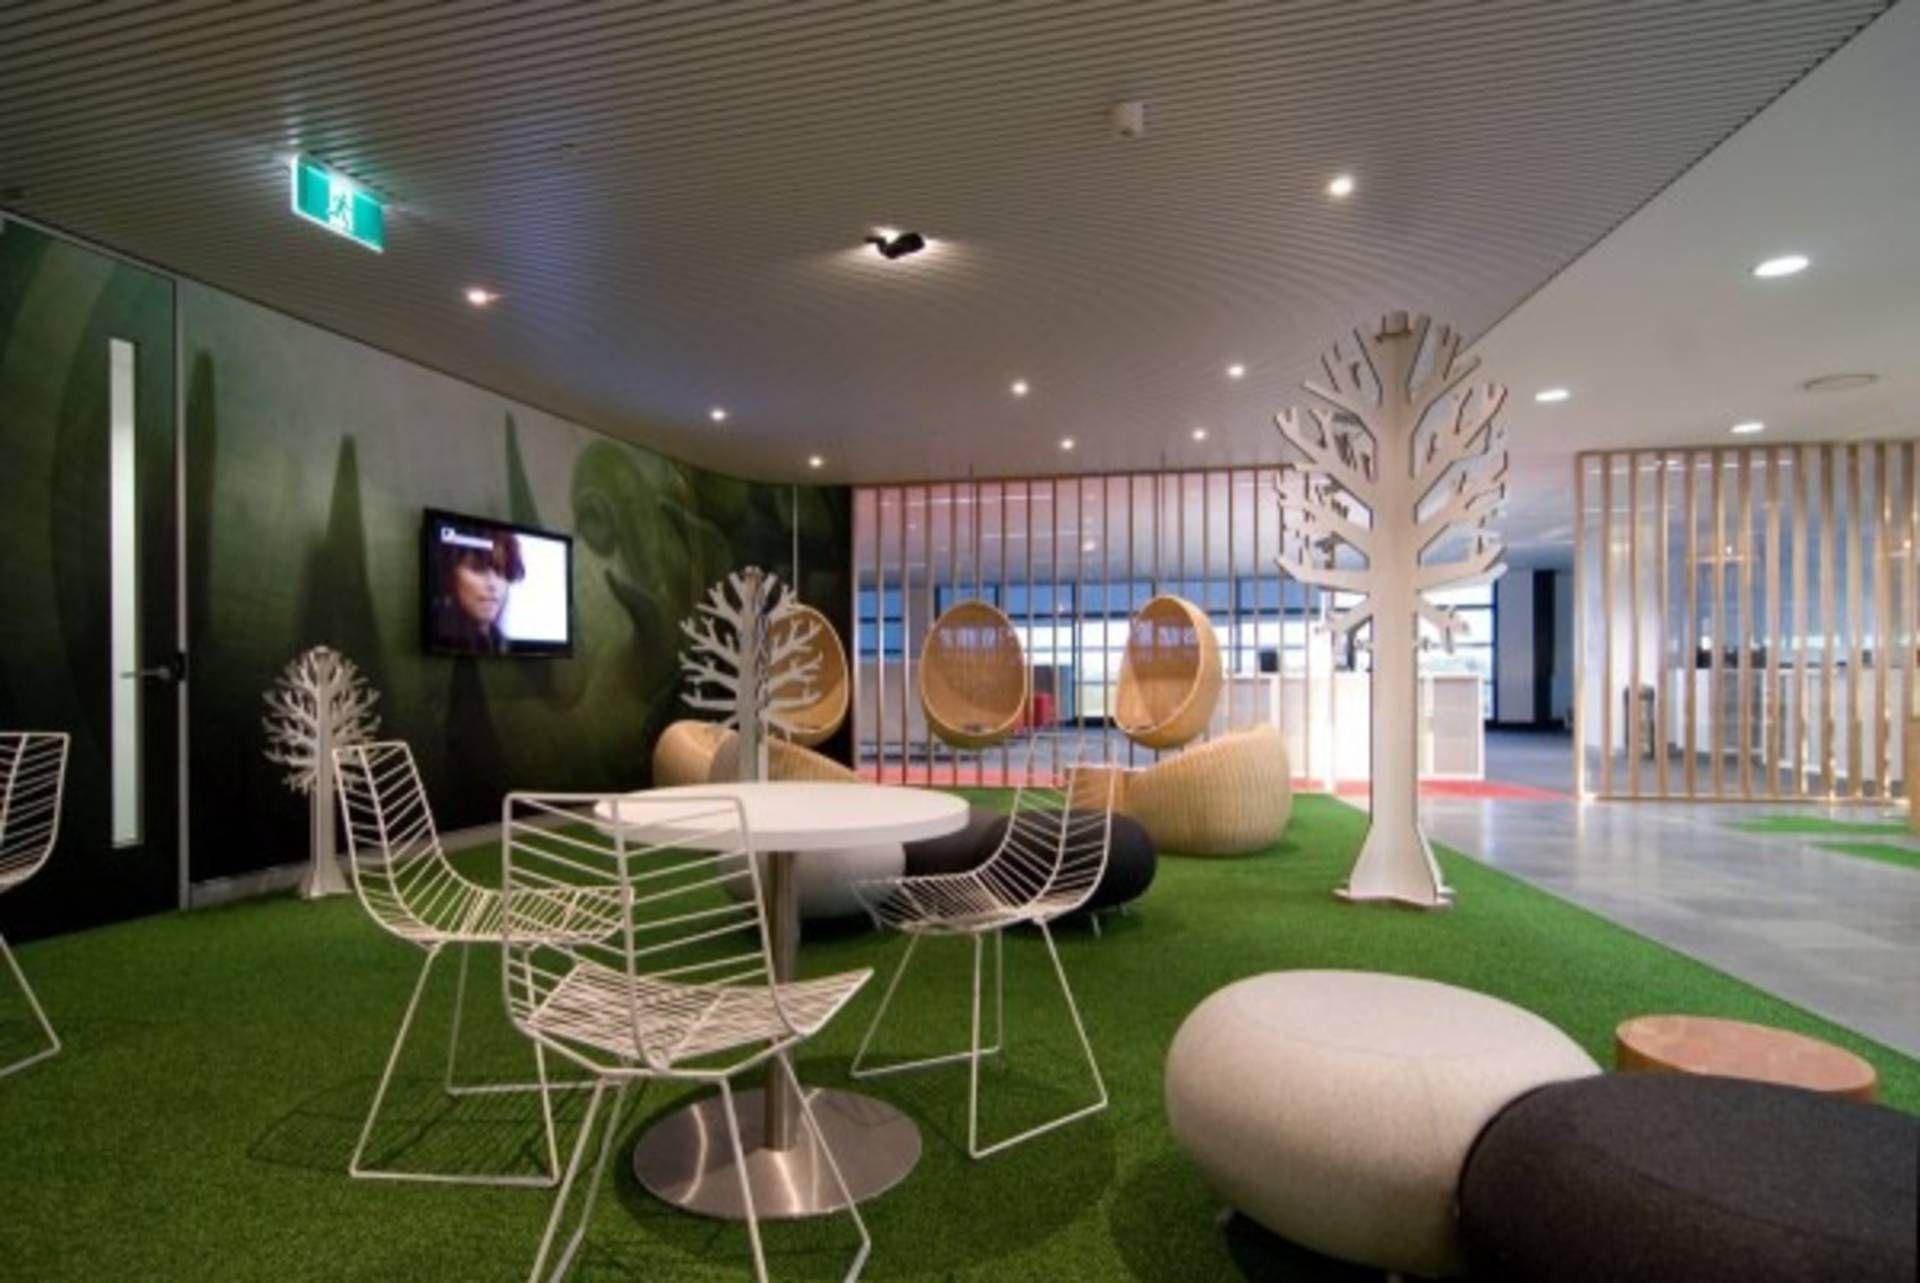 google office decor office entrance image result for google office interior designs design pinterest